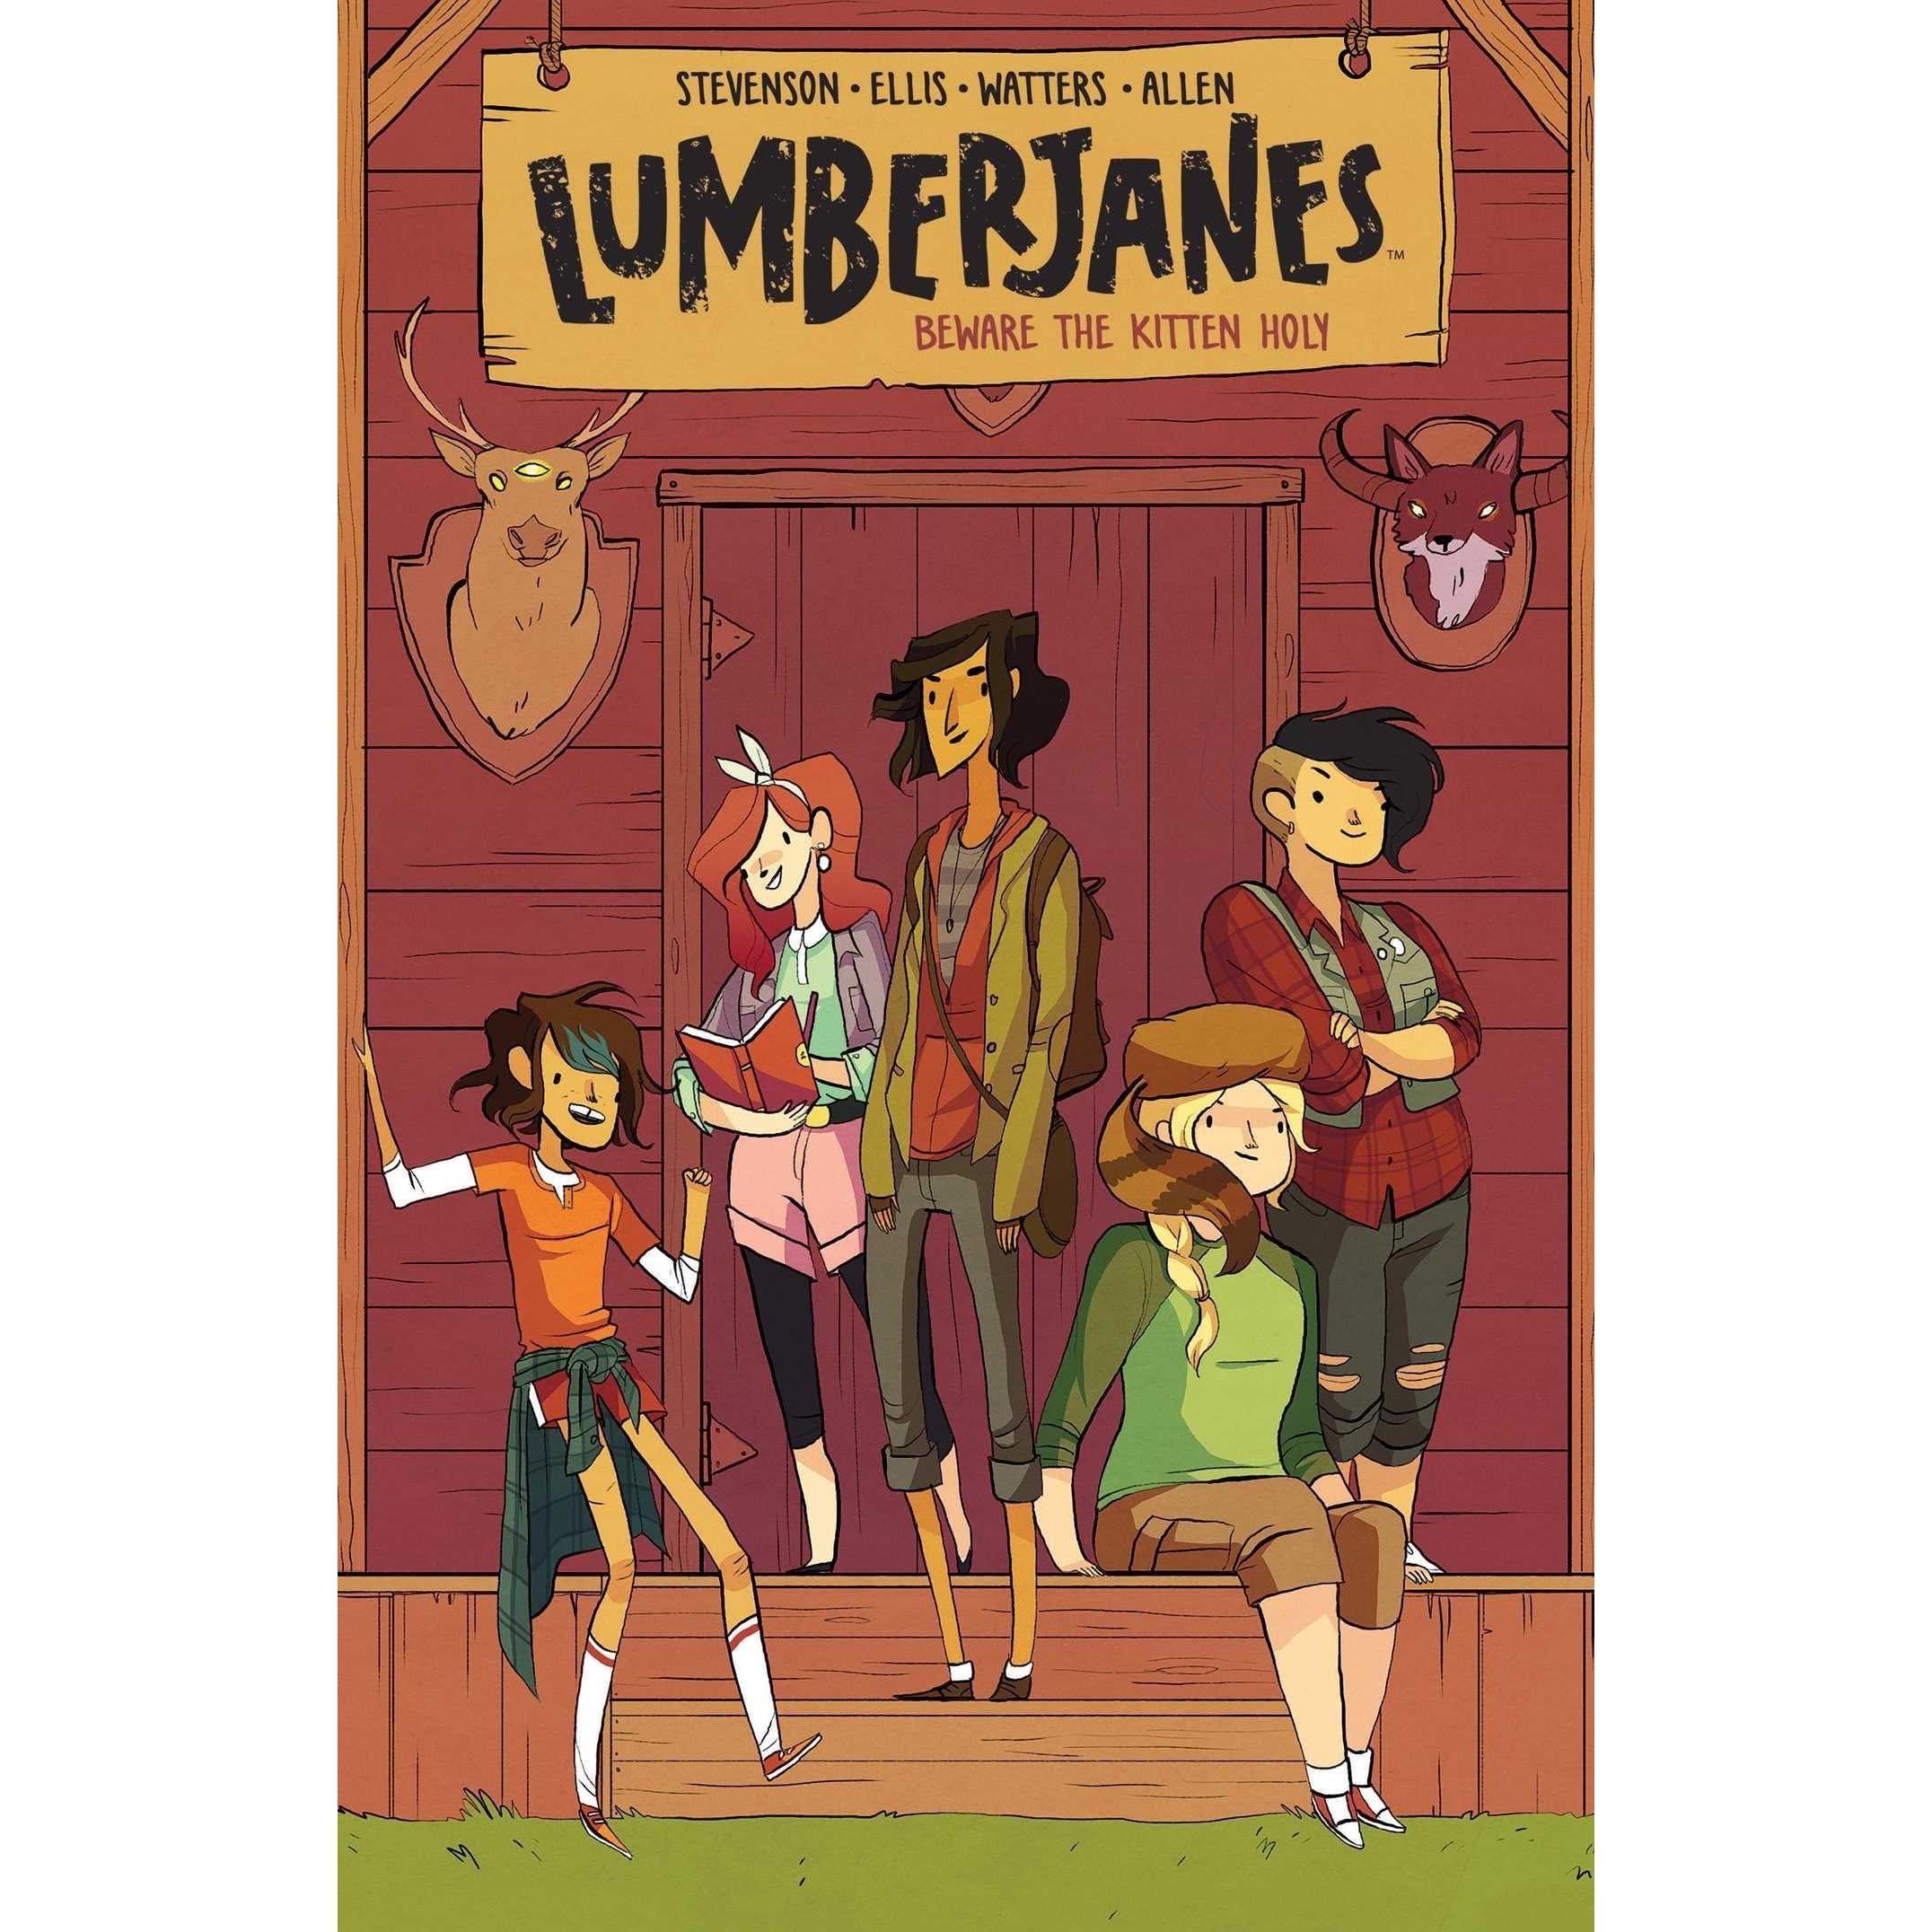 Image result for lumberjanes vol 1